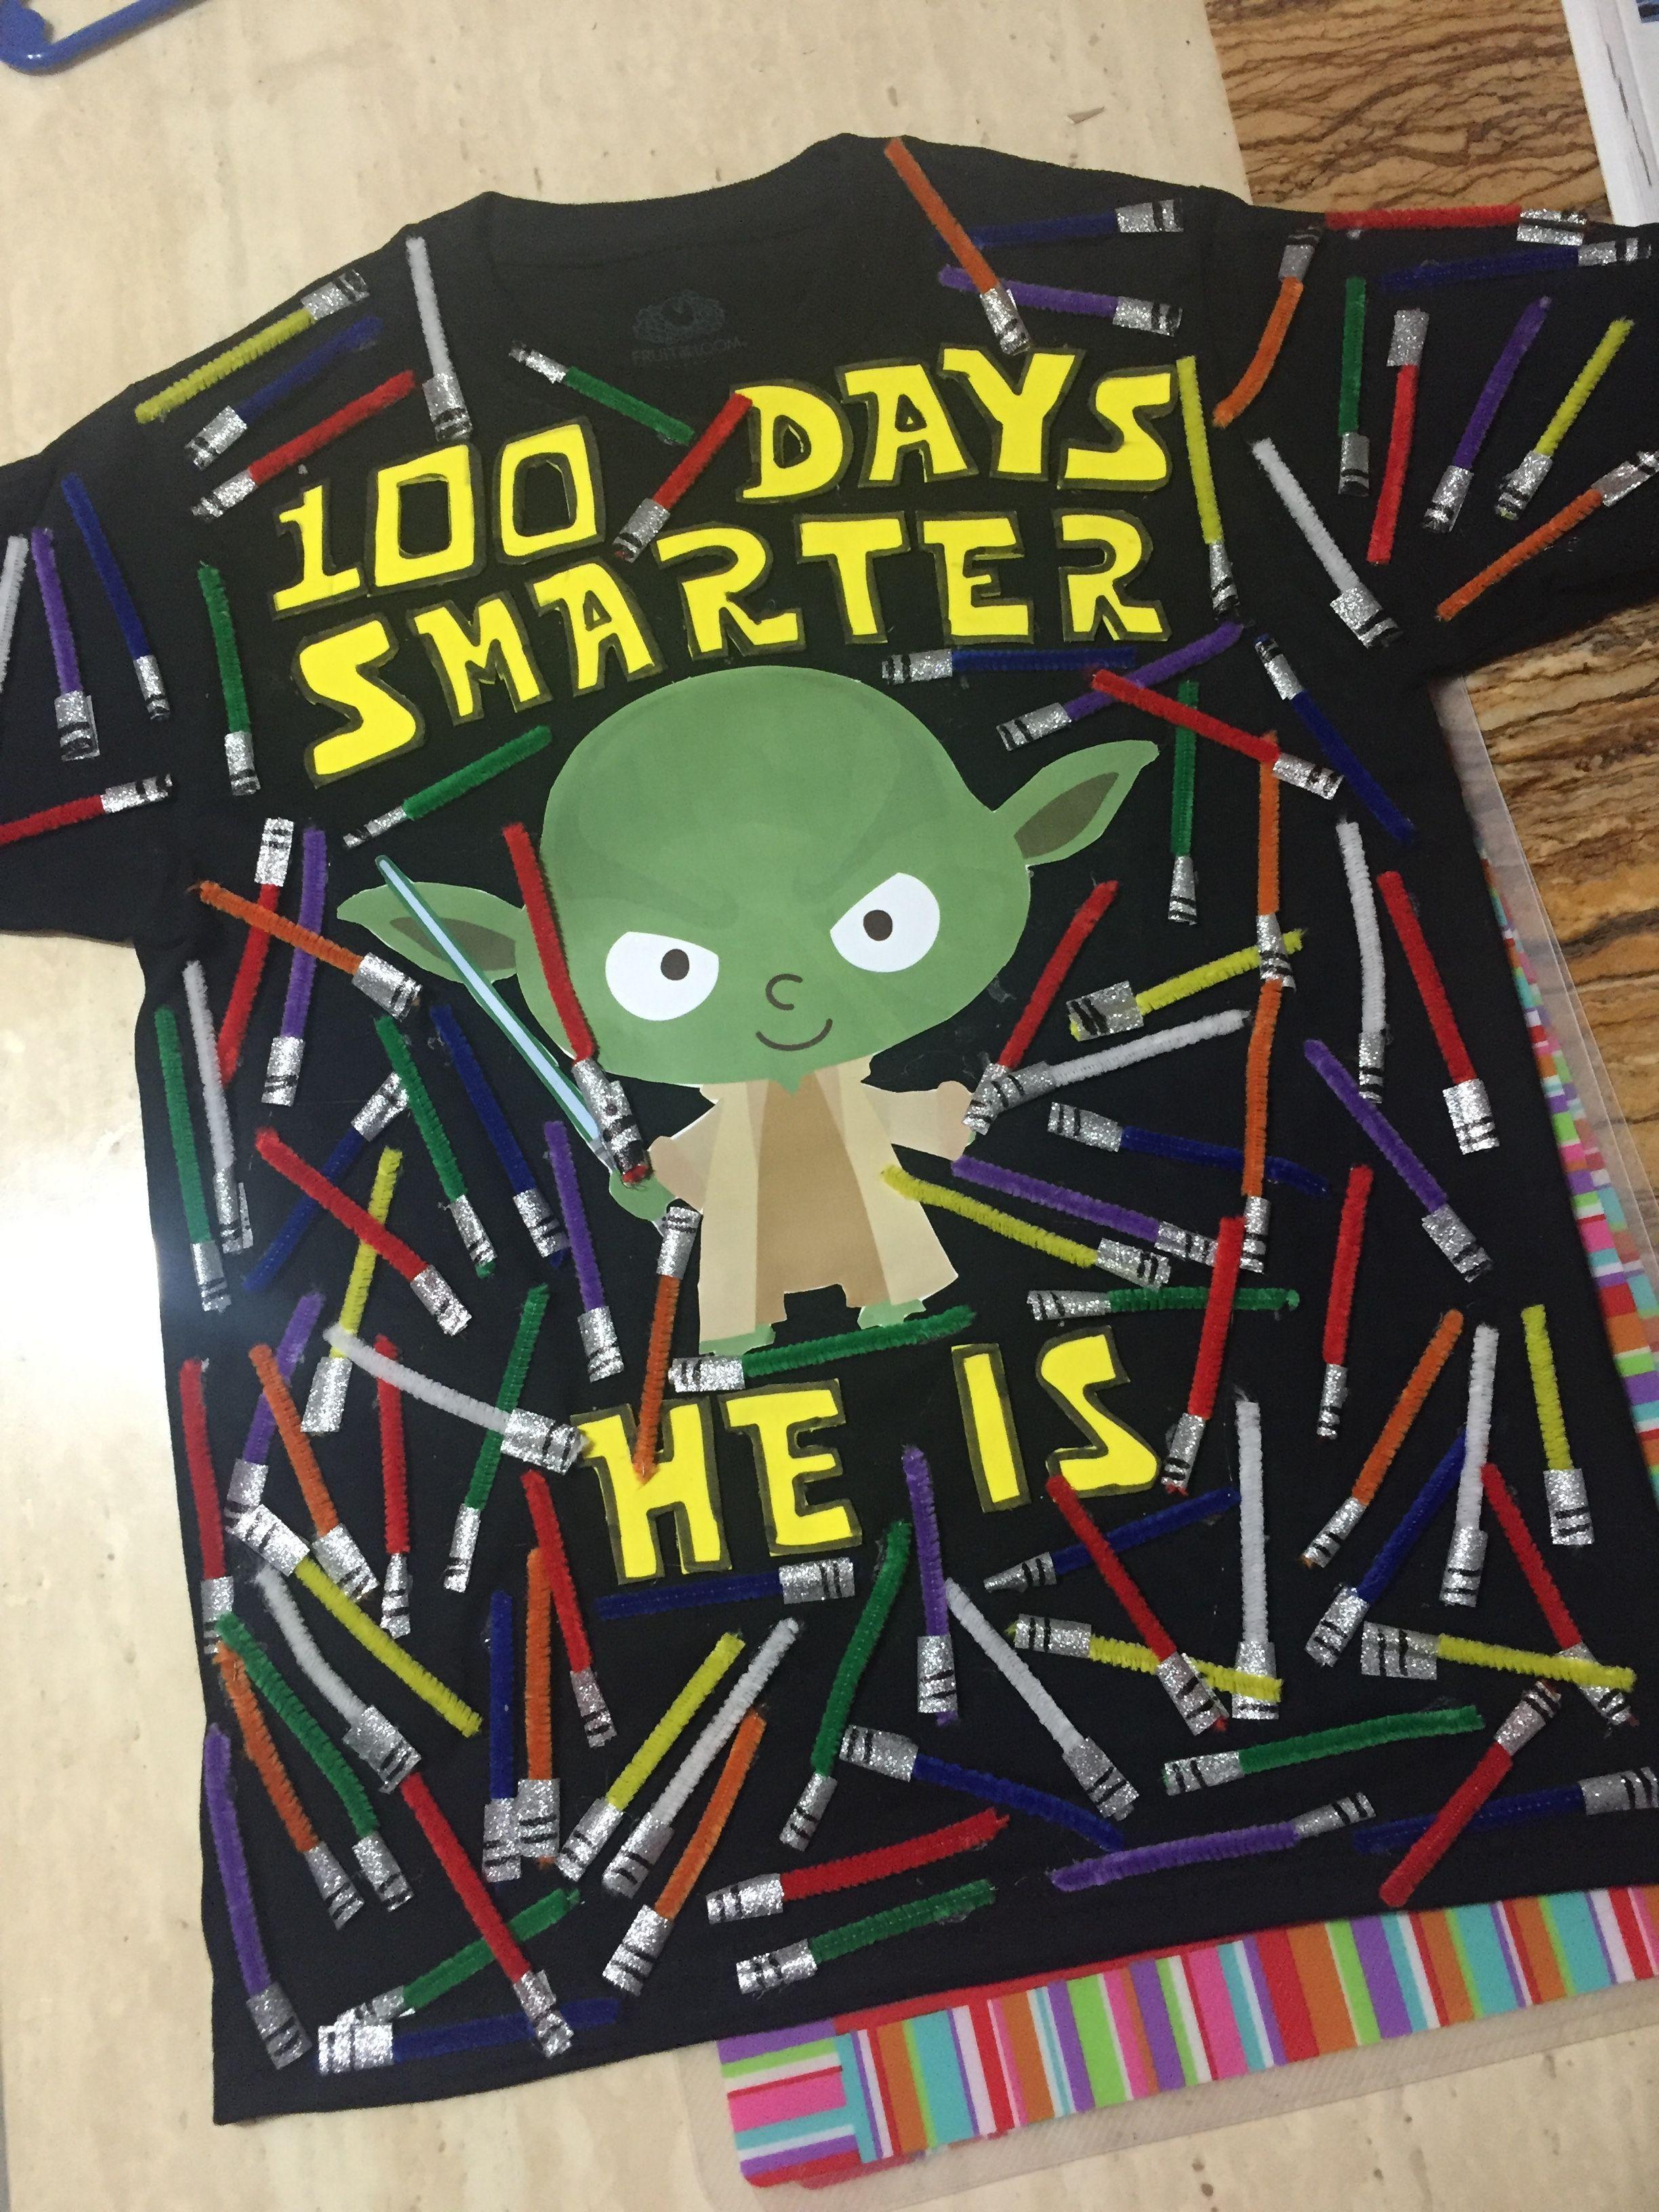 100 days of school shirt project Star Wars inspired - #days #Inspired #Project #school #Shi...